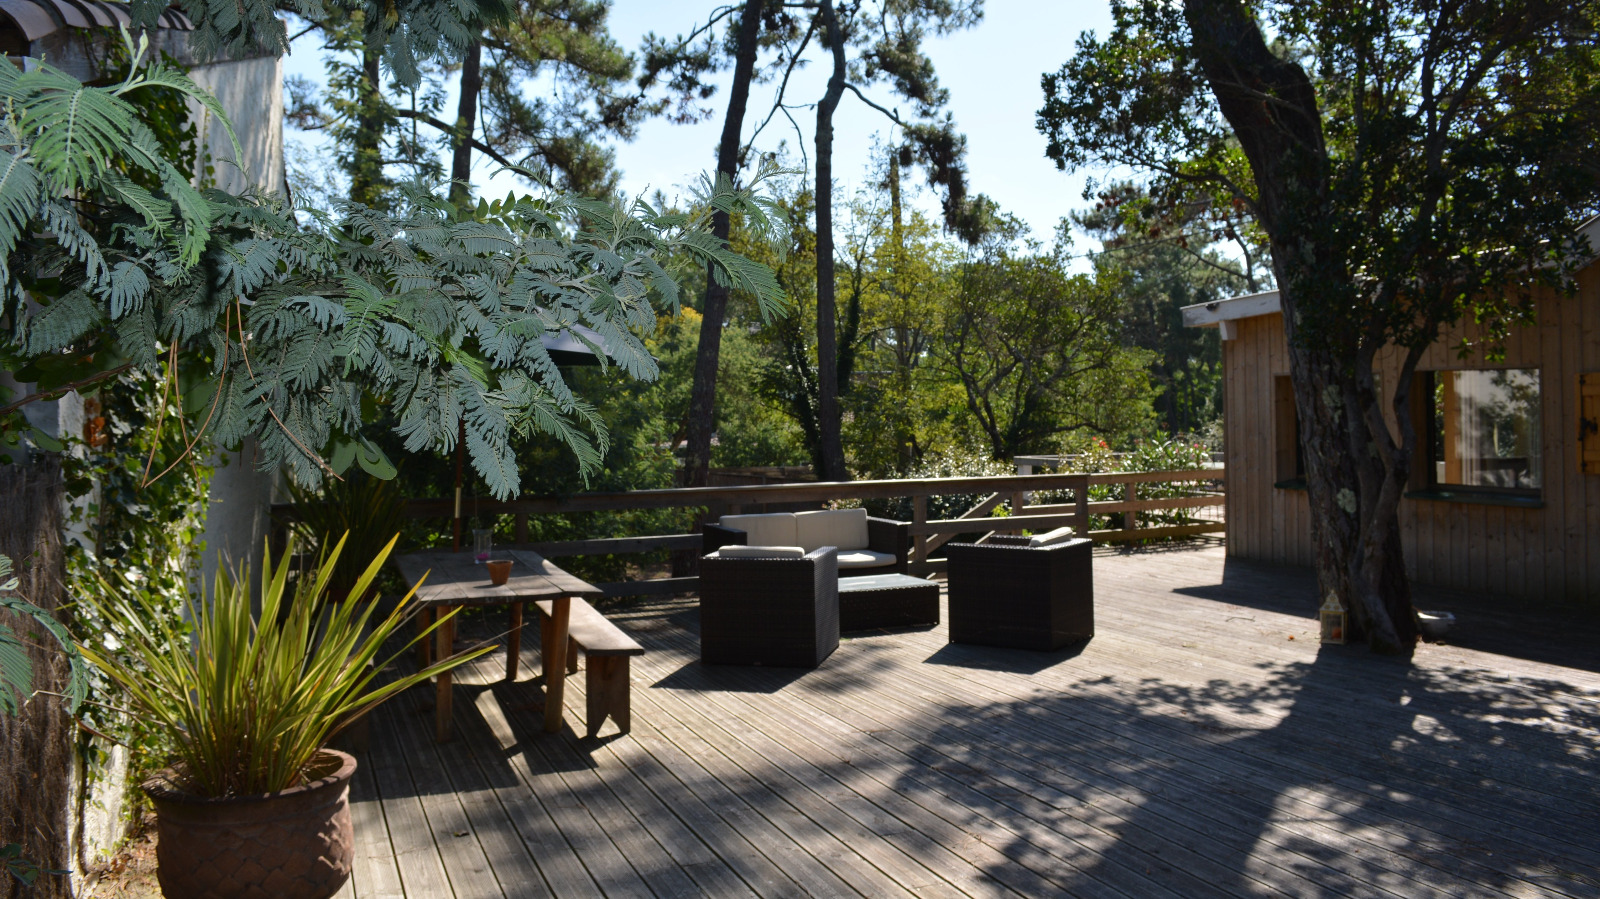 Cap ferret 44 hectares maison r nov e style cabane for Belles maisons du bassin